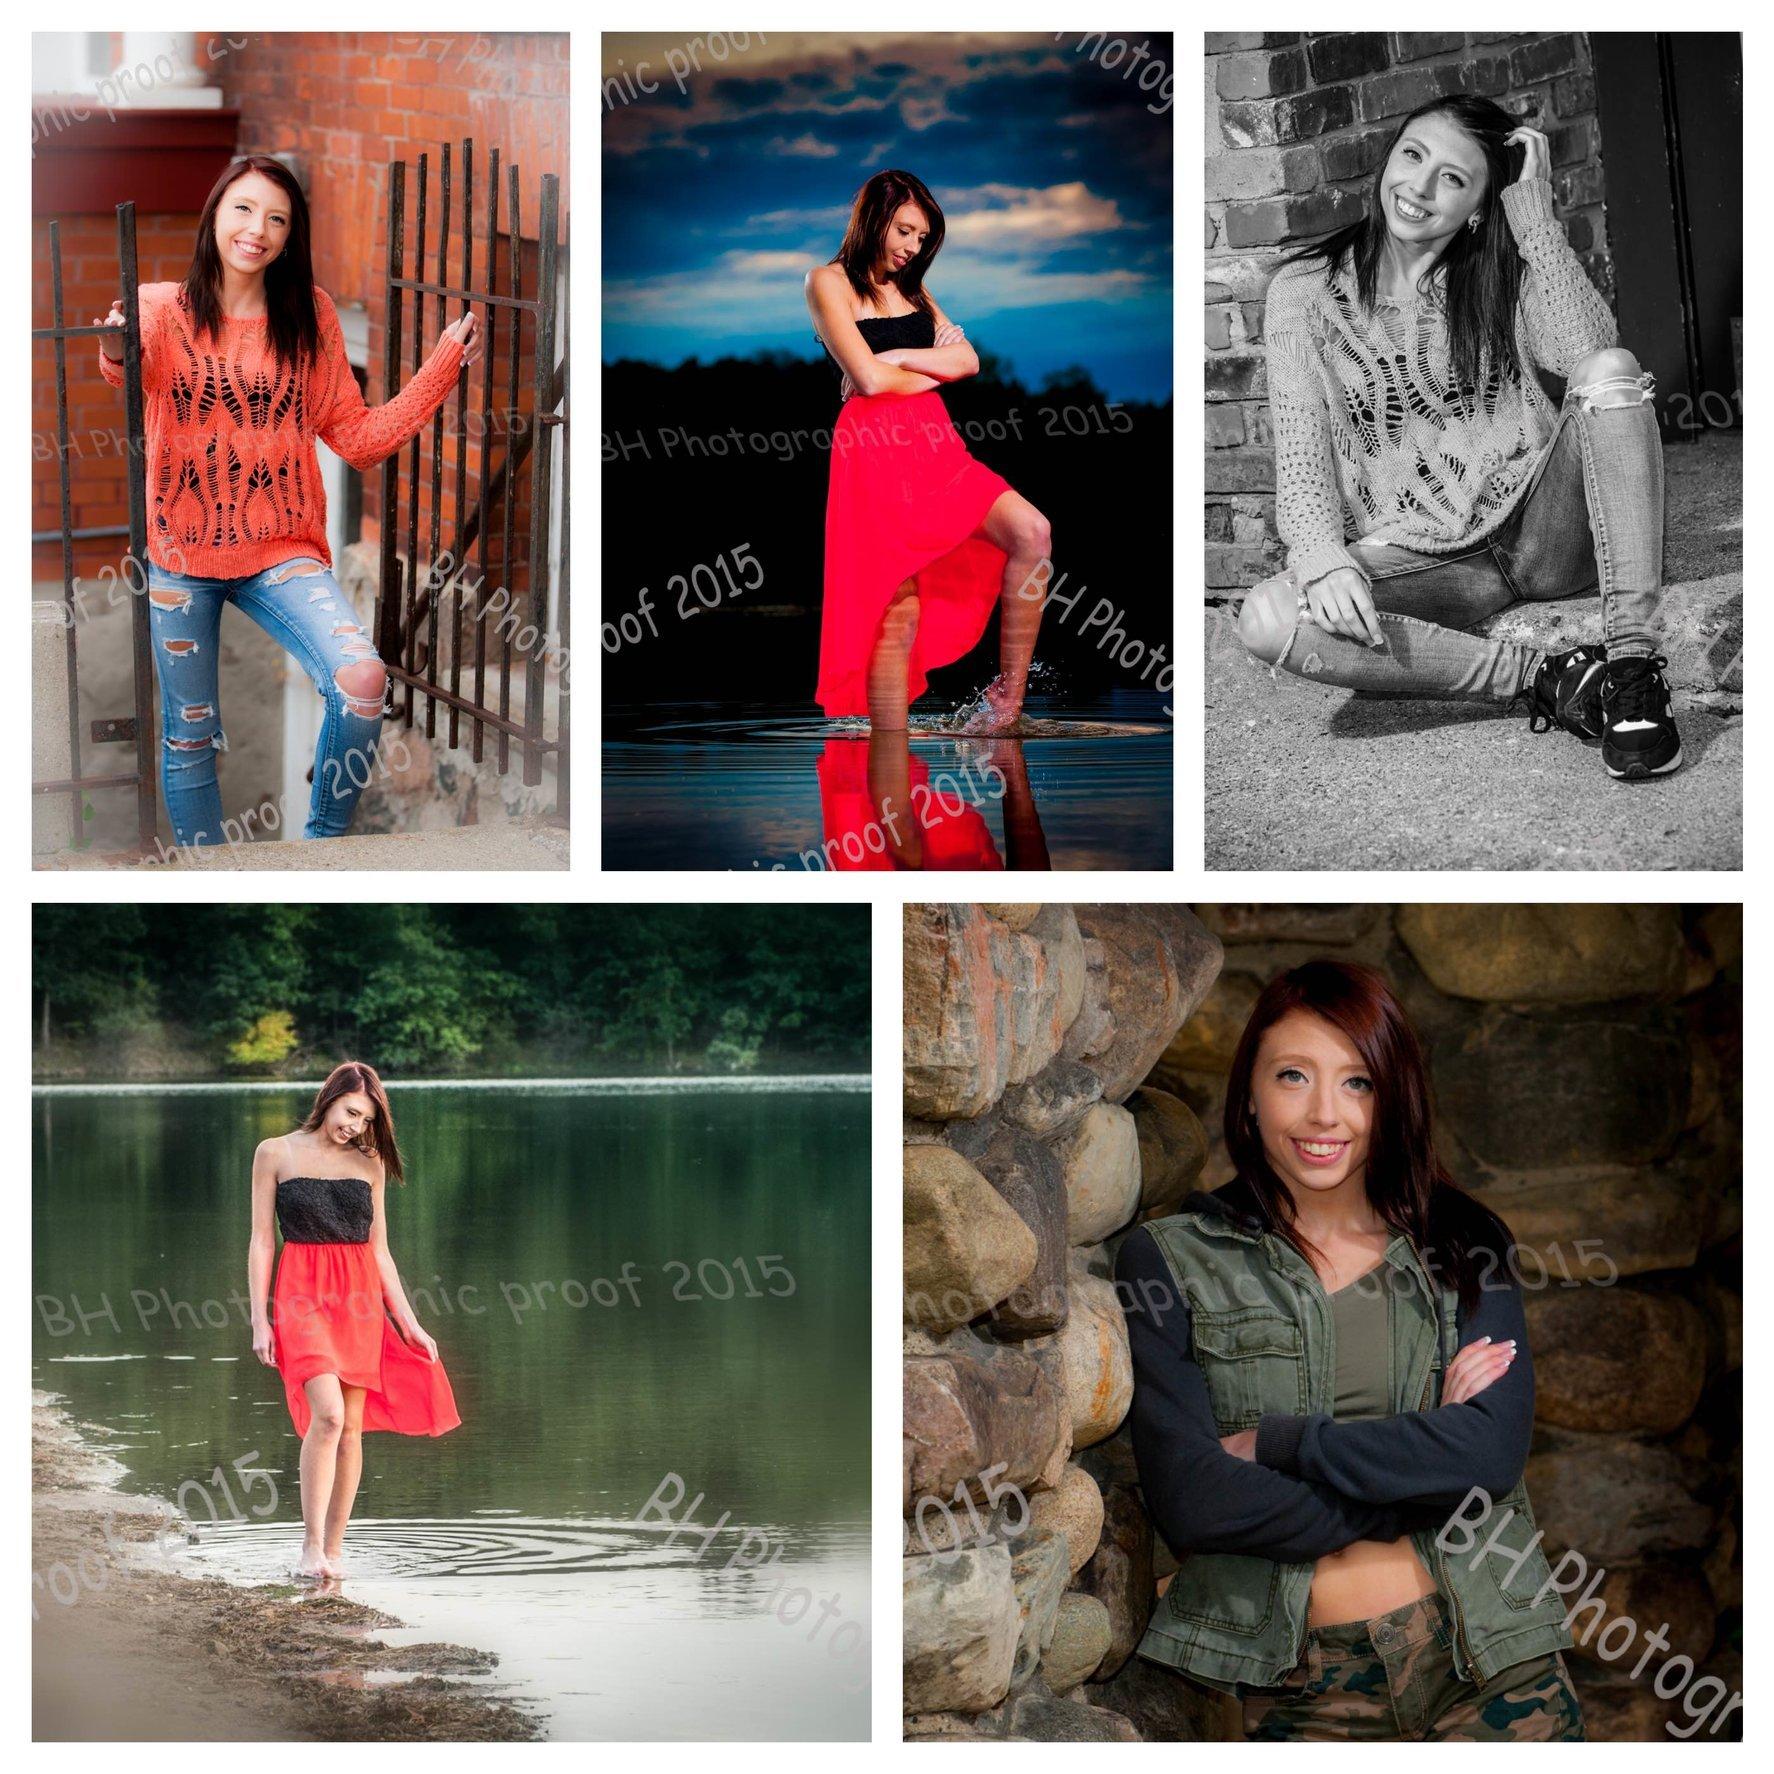 BH3_5133_Fotor_Collage MORGAN 2.jpg